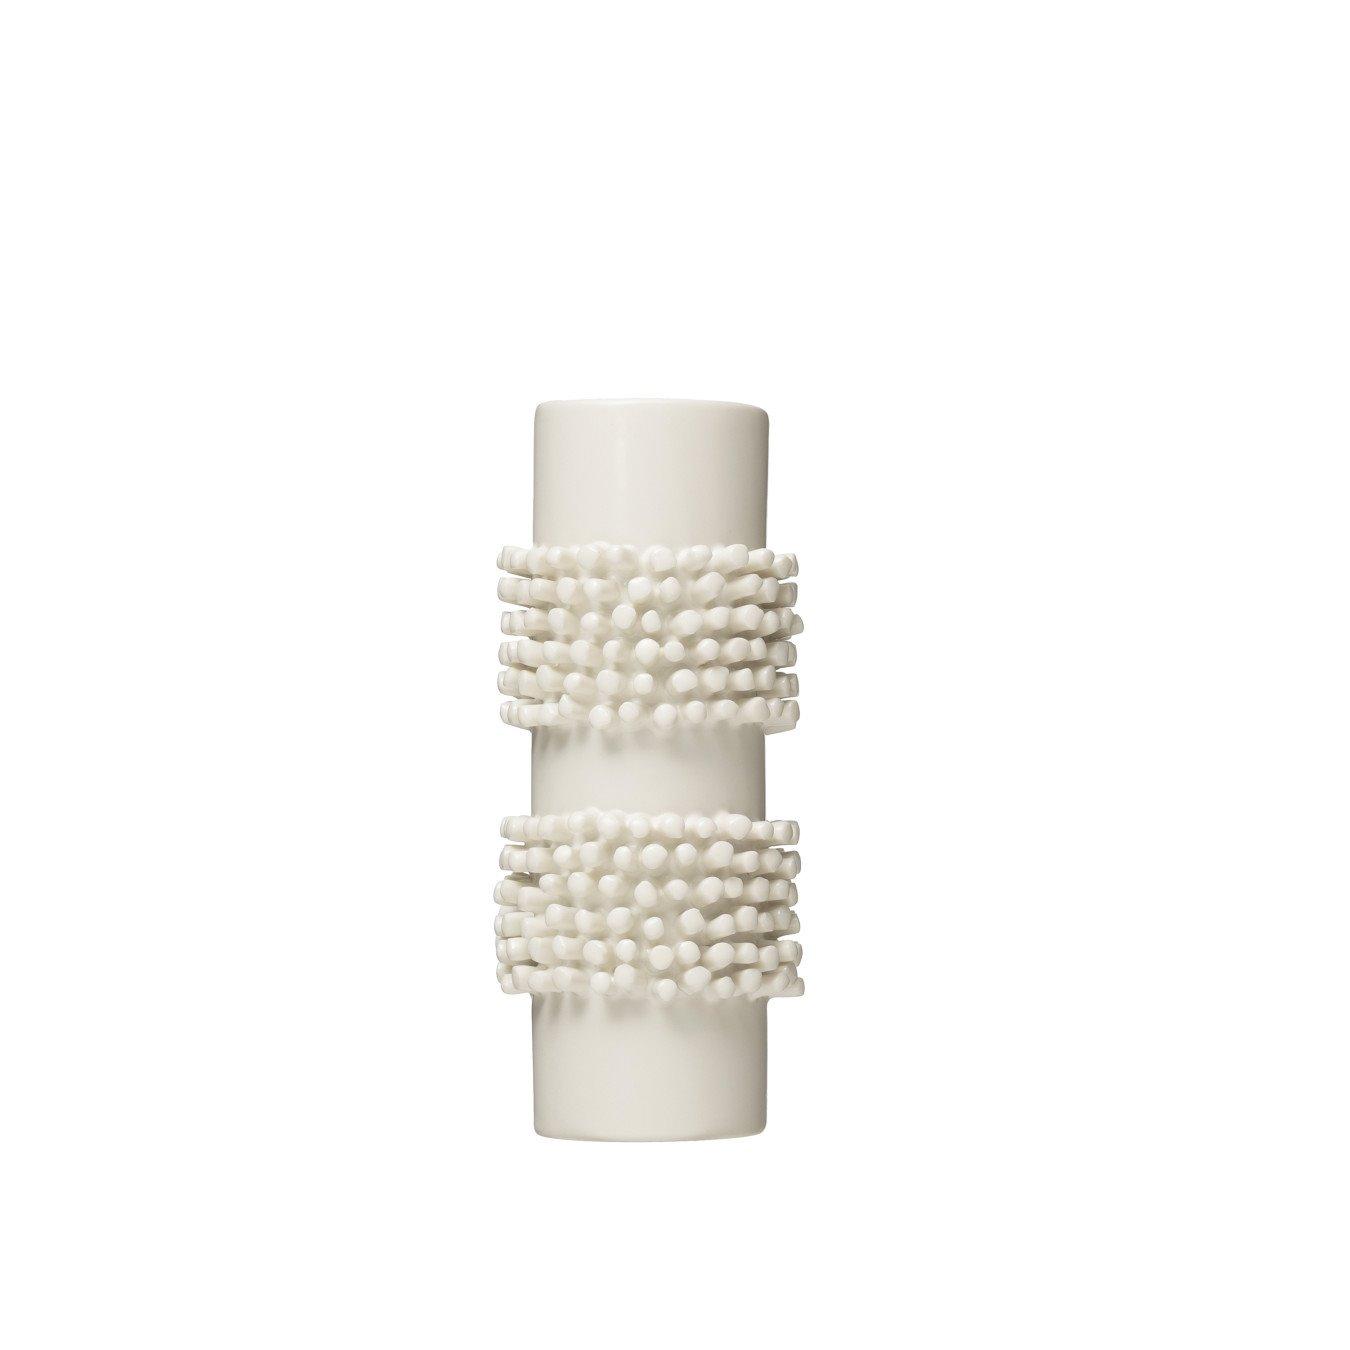 "Handmade 8""H Poodle Cut Stoneware Vase"